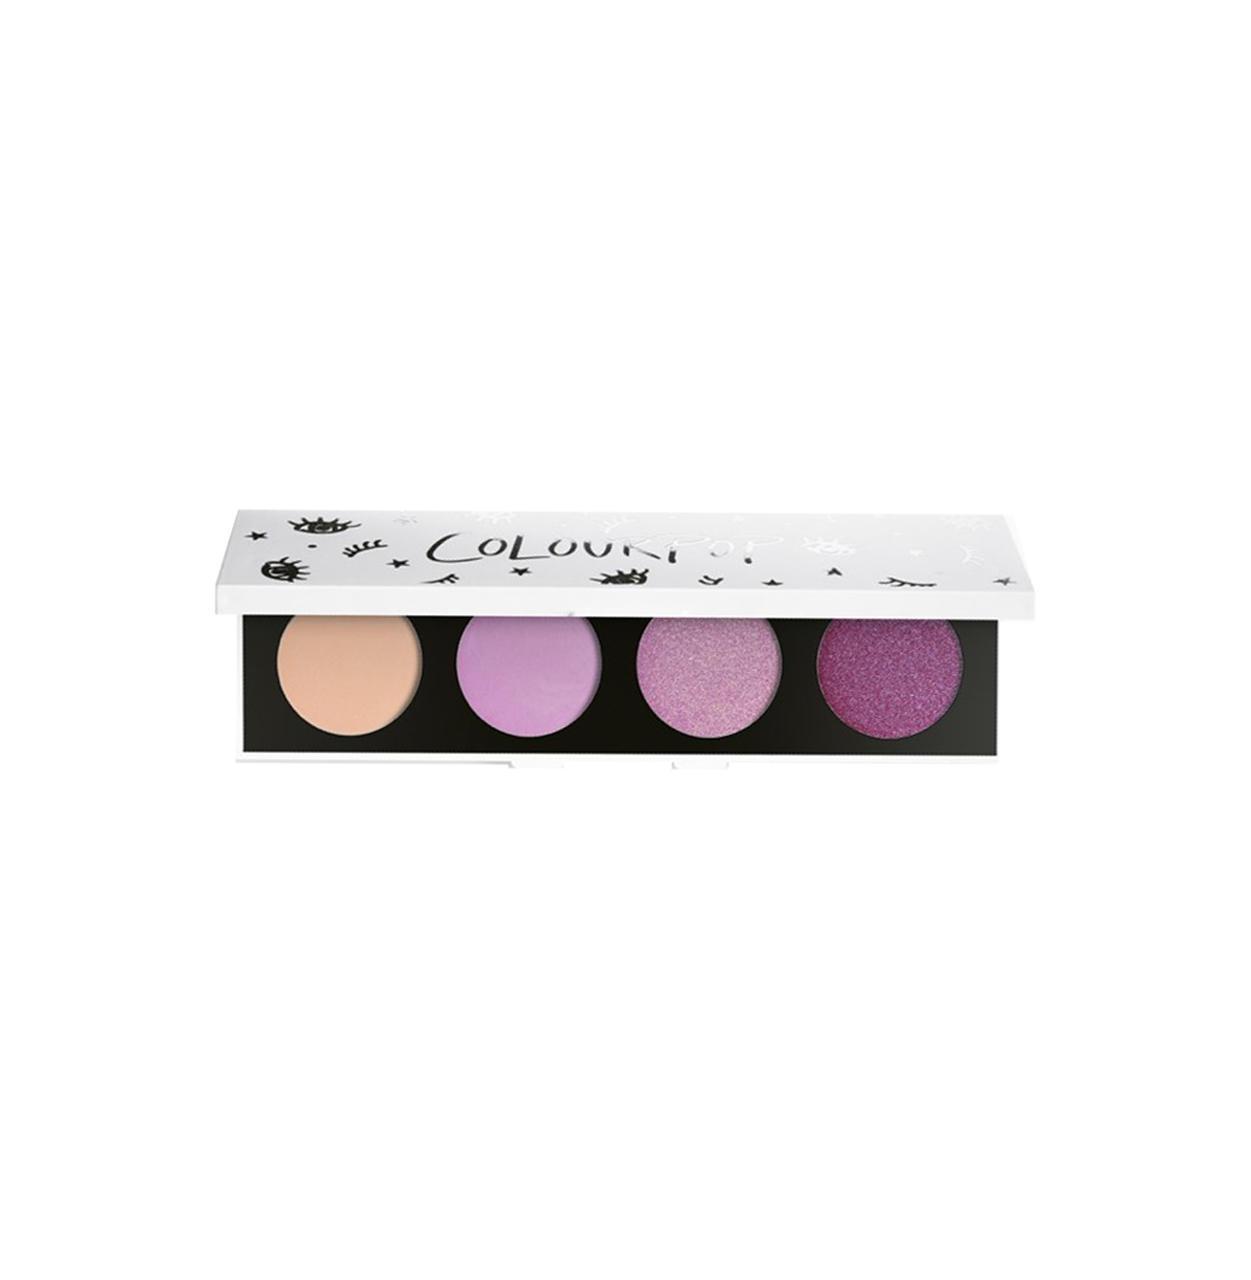 ColourPop Eyeshadow Palette Feel A Way